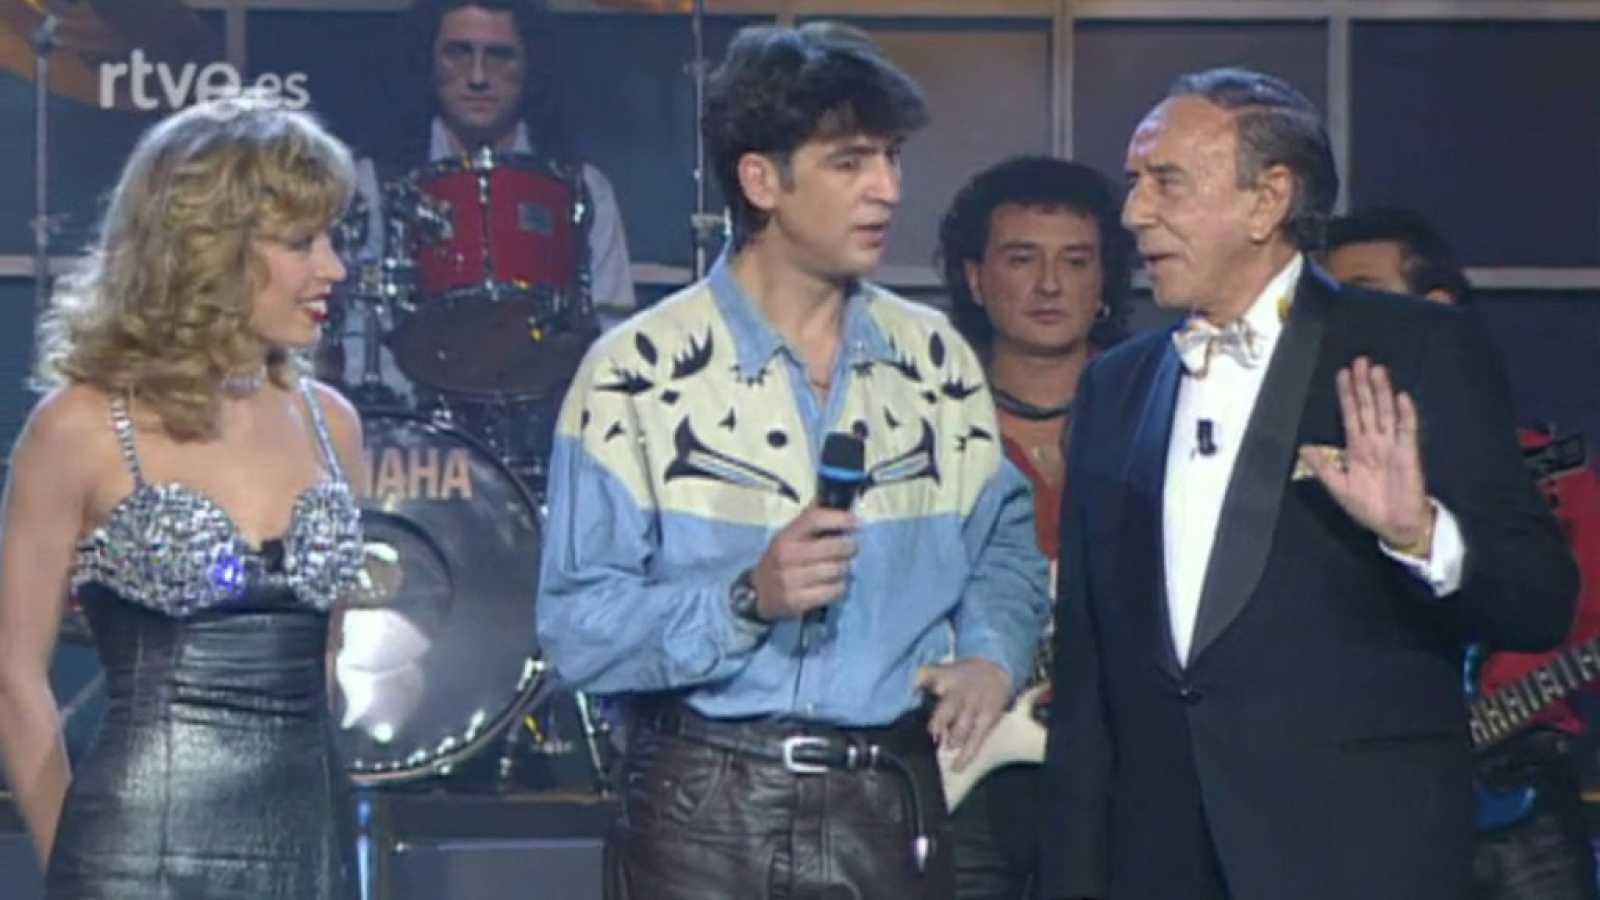 Noches de gala - 30/10/1993